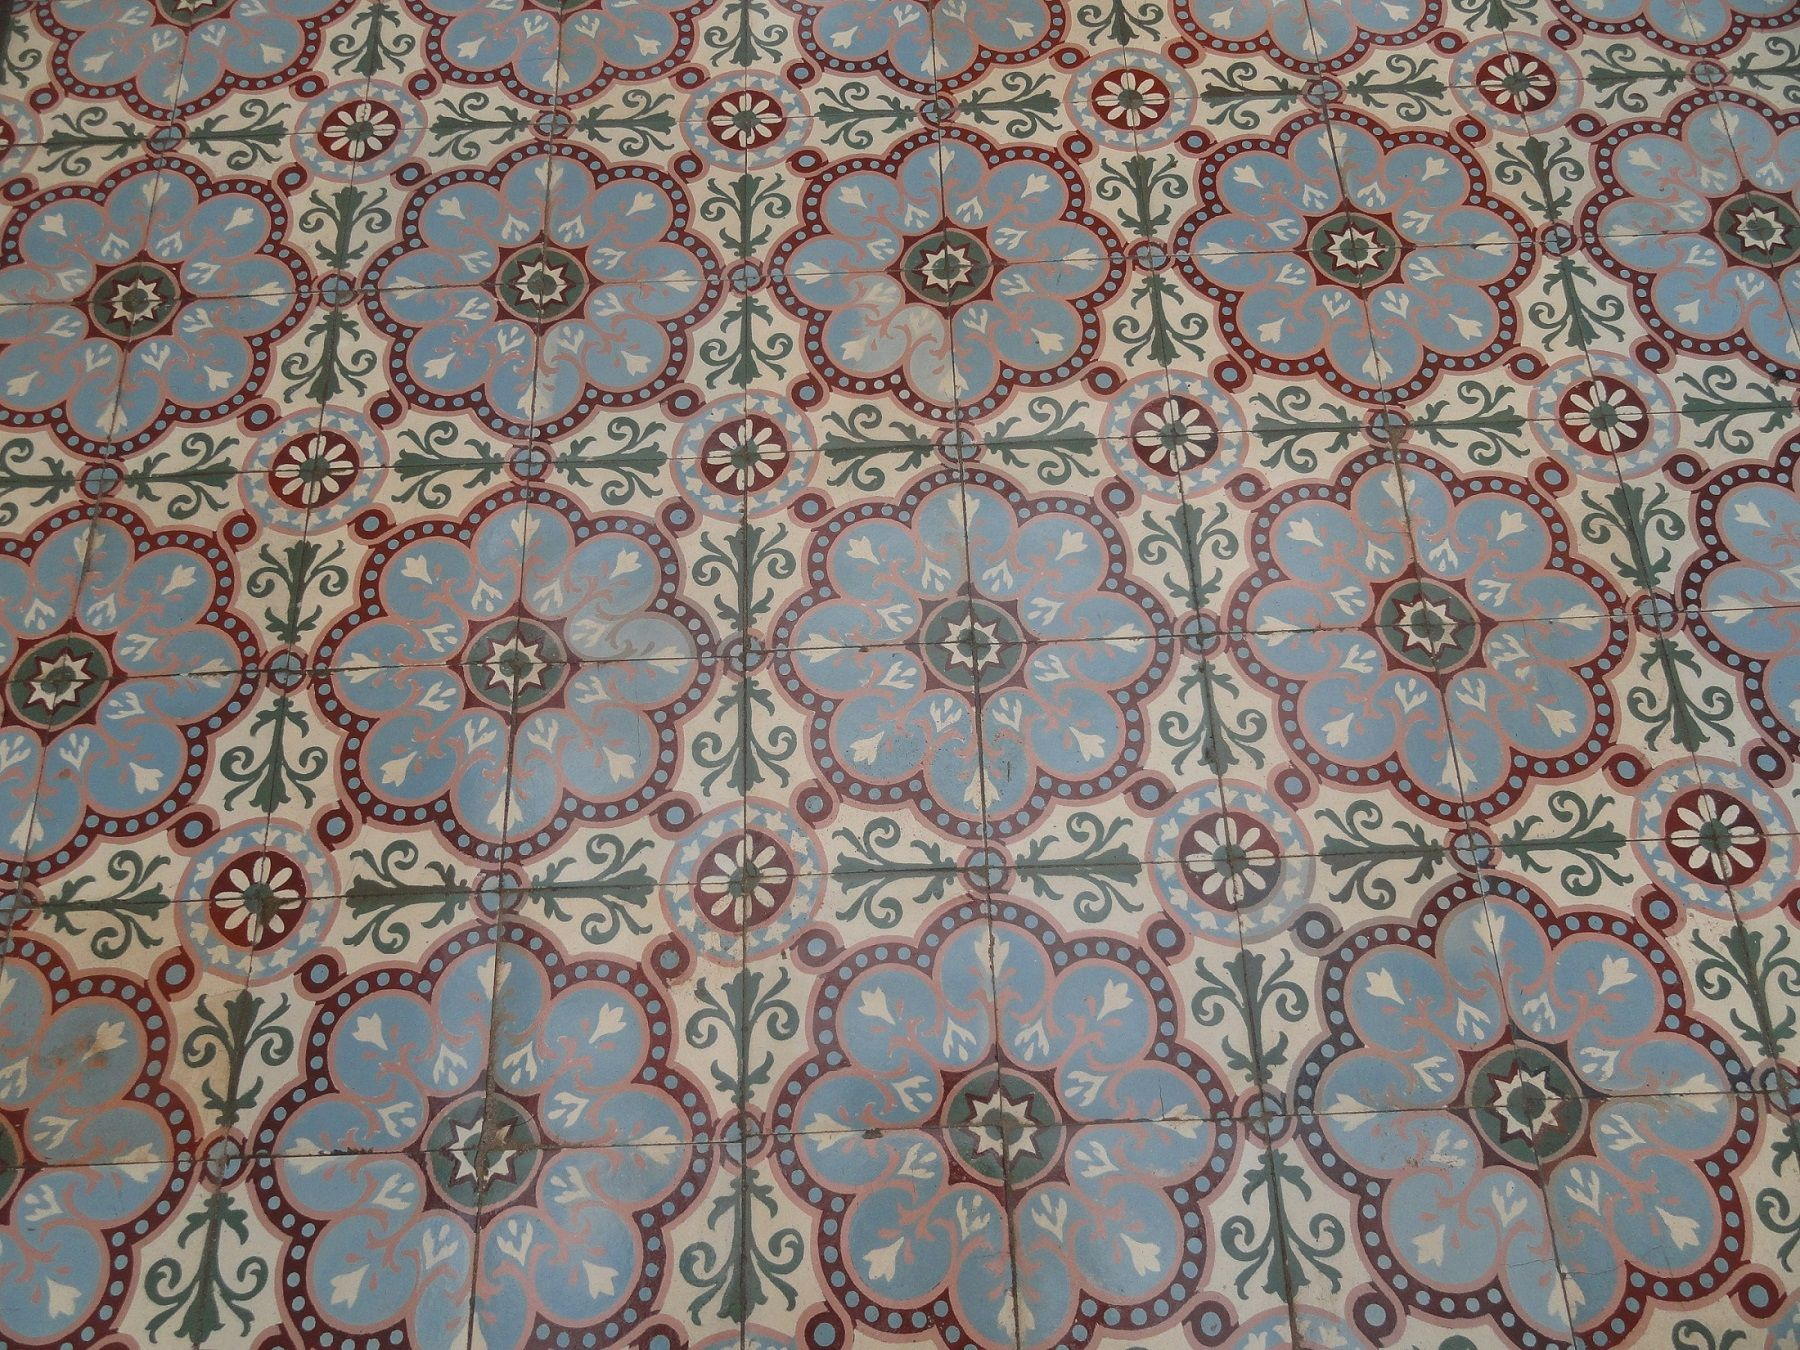 Oude vloertegels Antieke vloertegels www.floorz.nl www.floorz.be